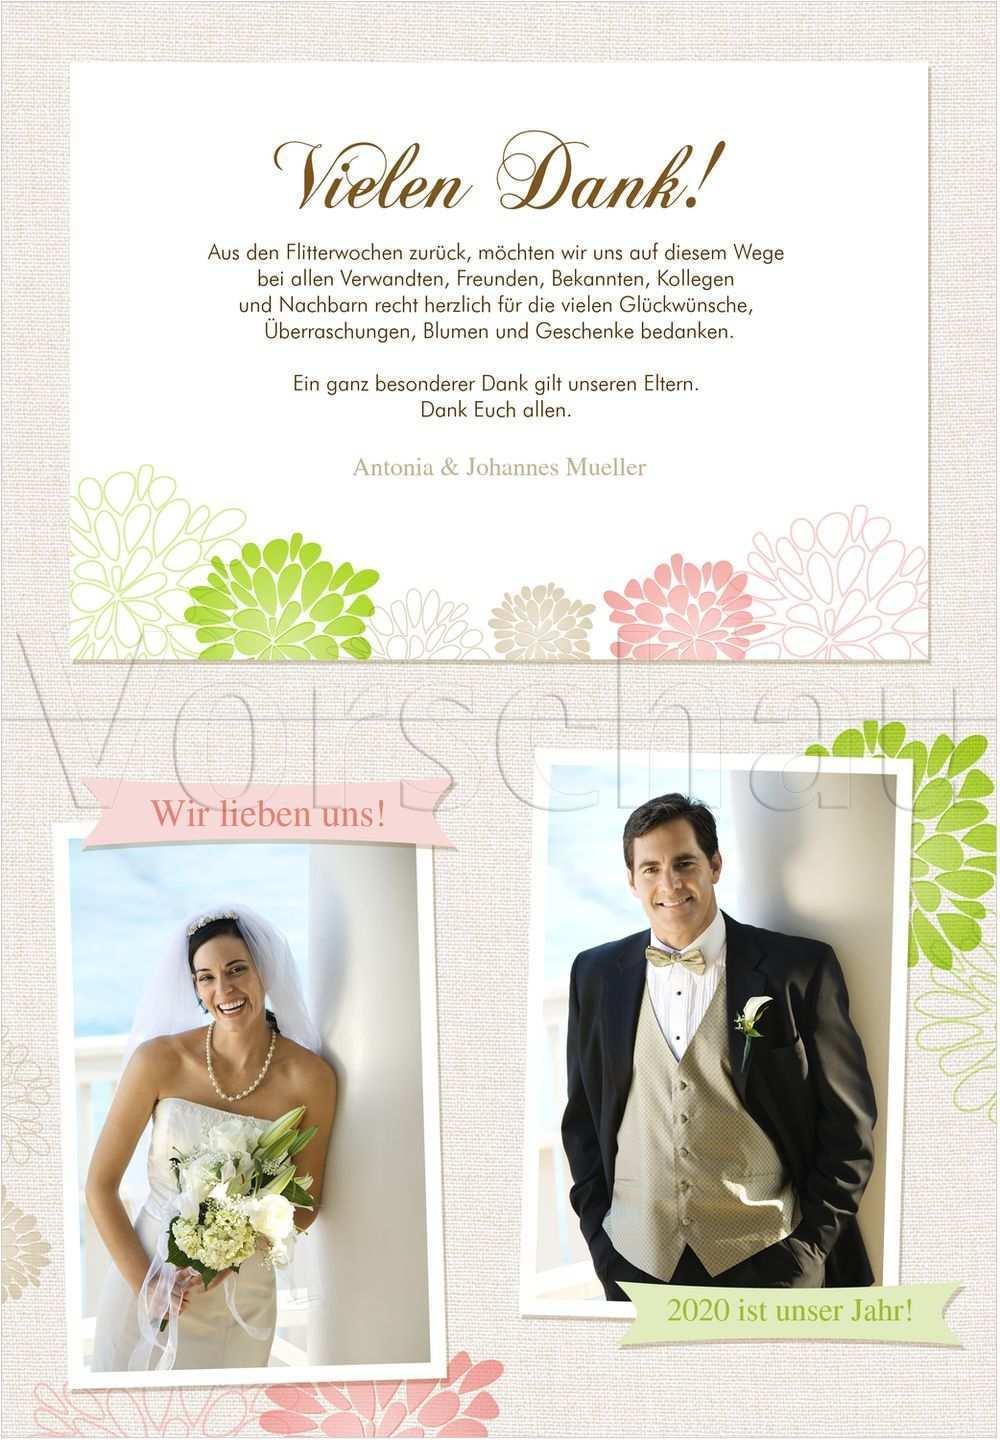 Bluhend Dankeskarten Hochzeit Dankes Karten Hochzeit Karte Hochzeit Danksagung Hochzeit